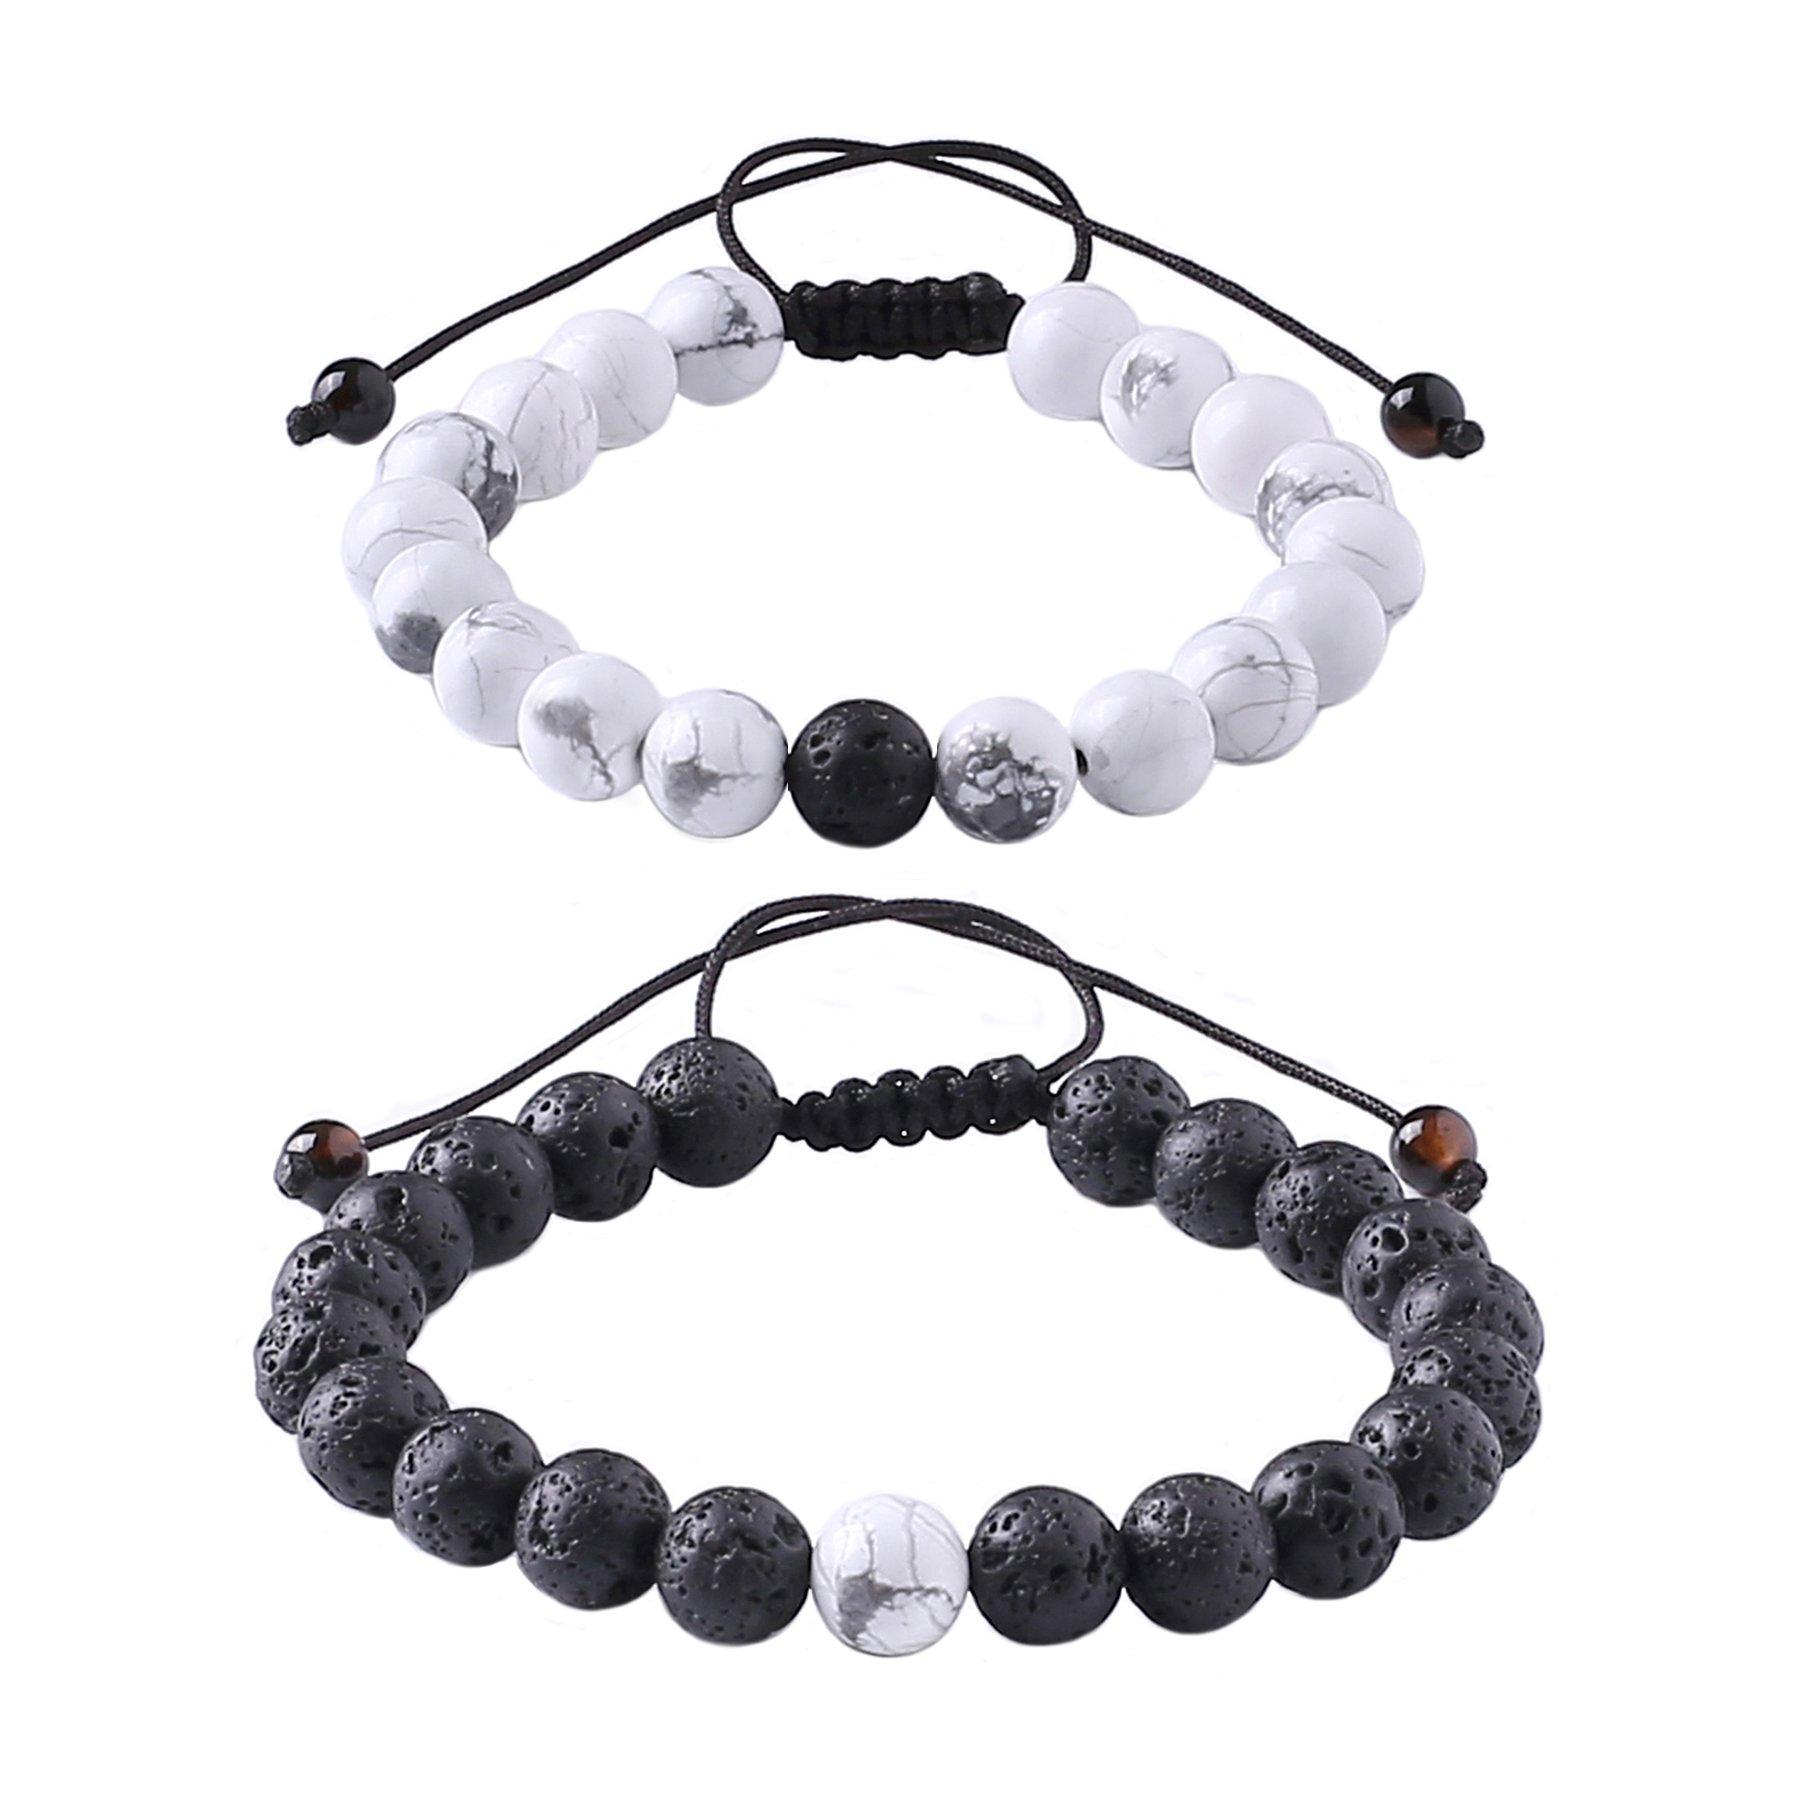 Distance Relationship Bracelet for Lover-2pcs Black Lava Rock & White Howlite Stone 8mm Beads (Braided)